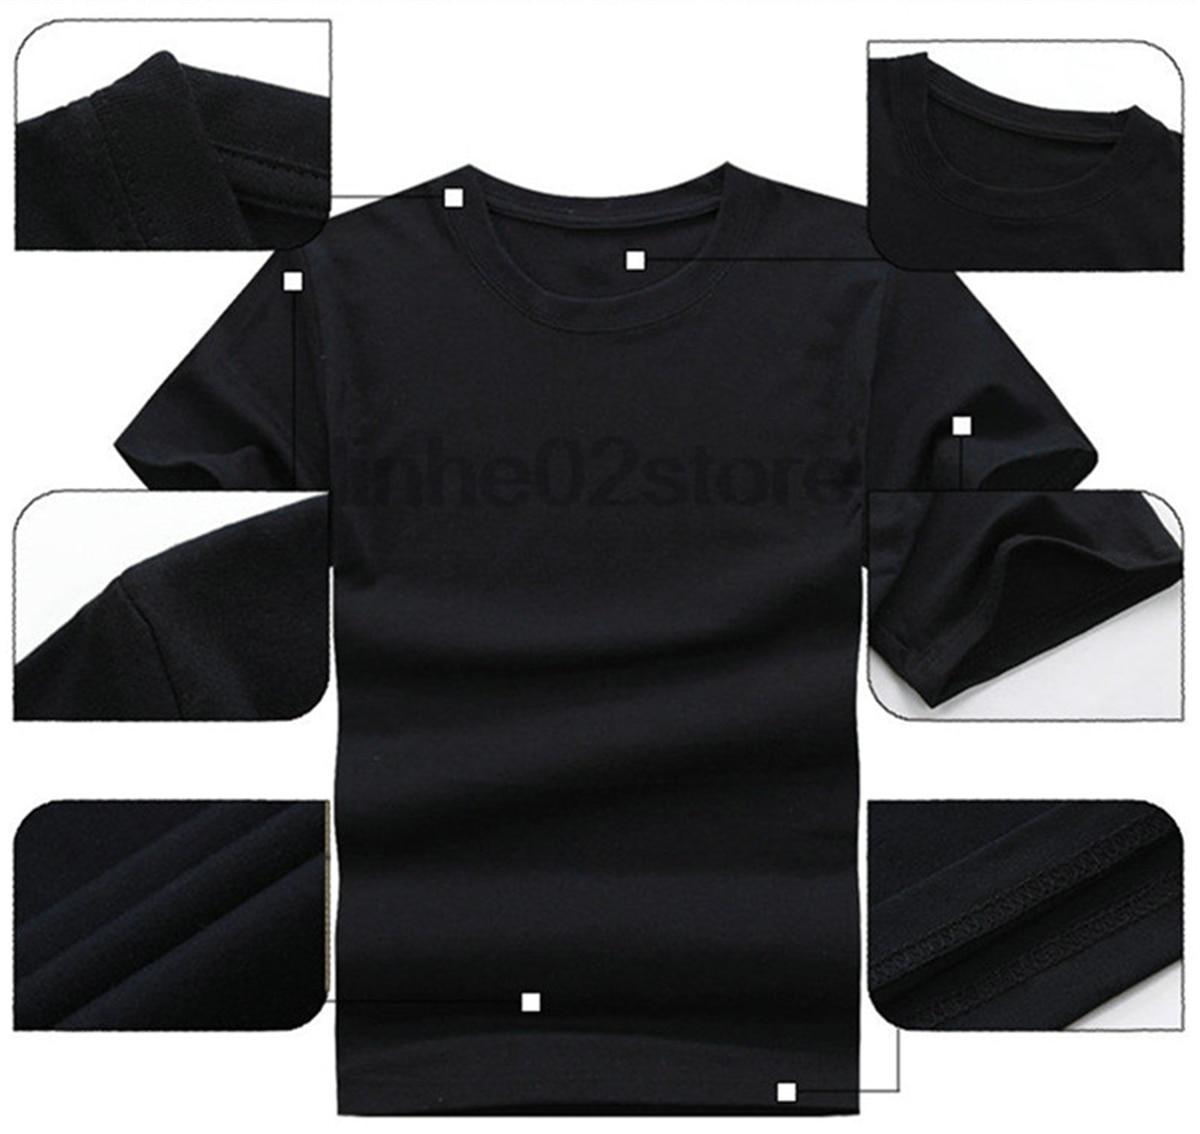 GILDAN I Make My Own Safe Space T-shirt Dress female T-shirt glasses Womens T-shirt